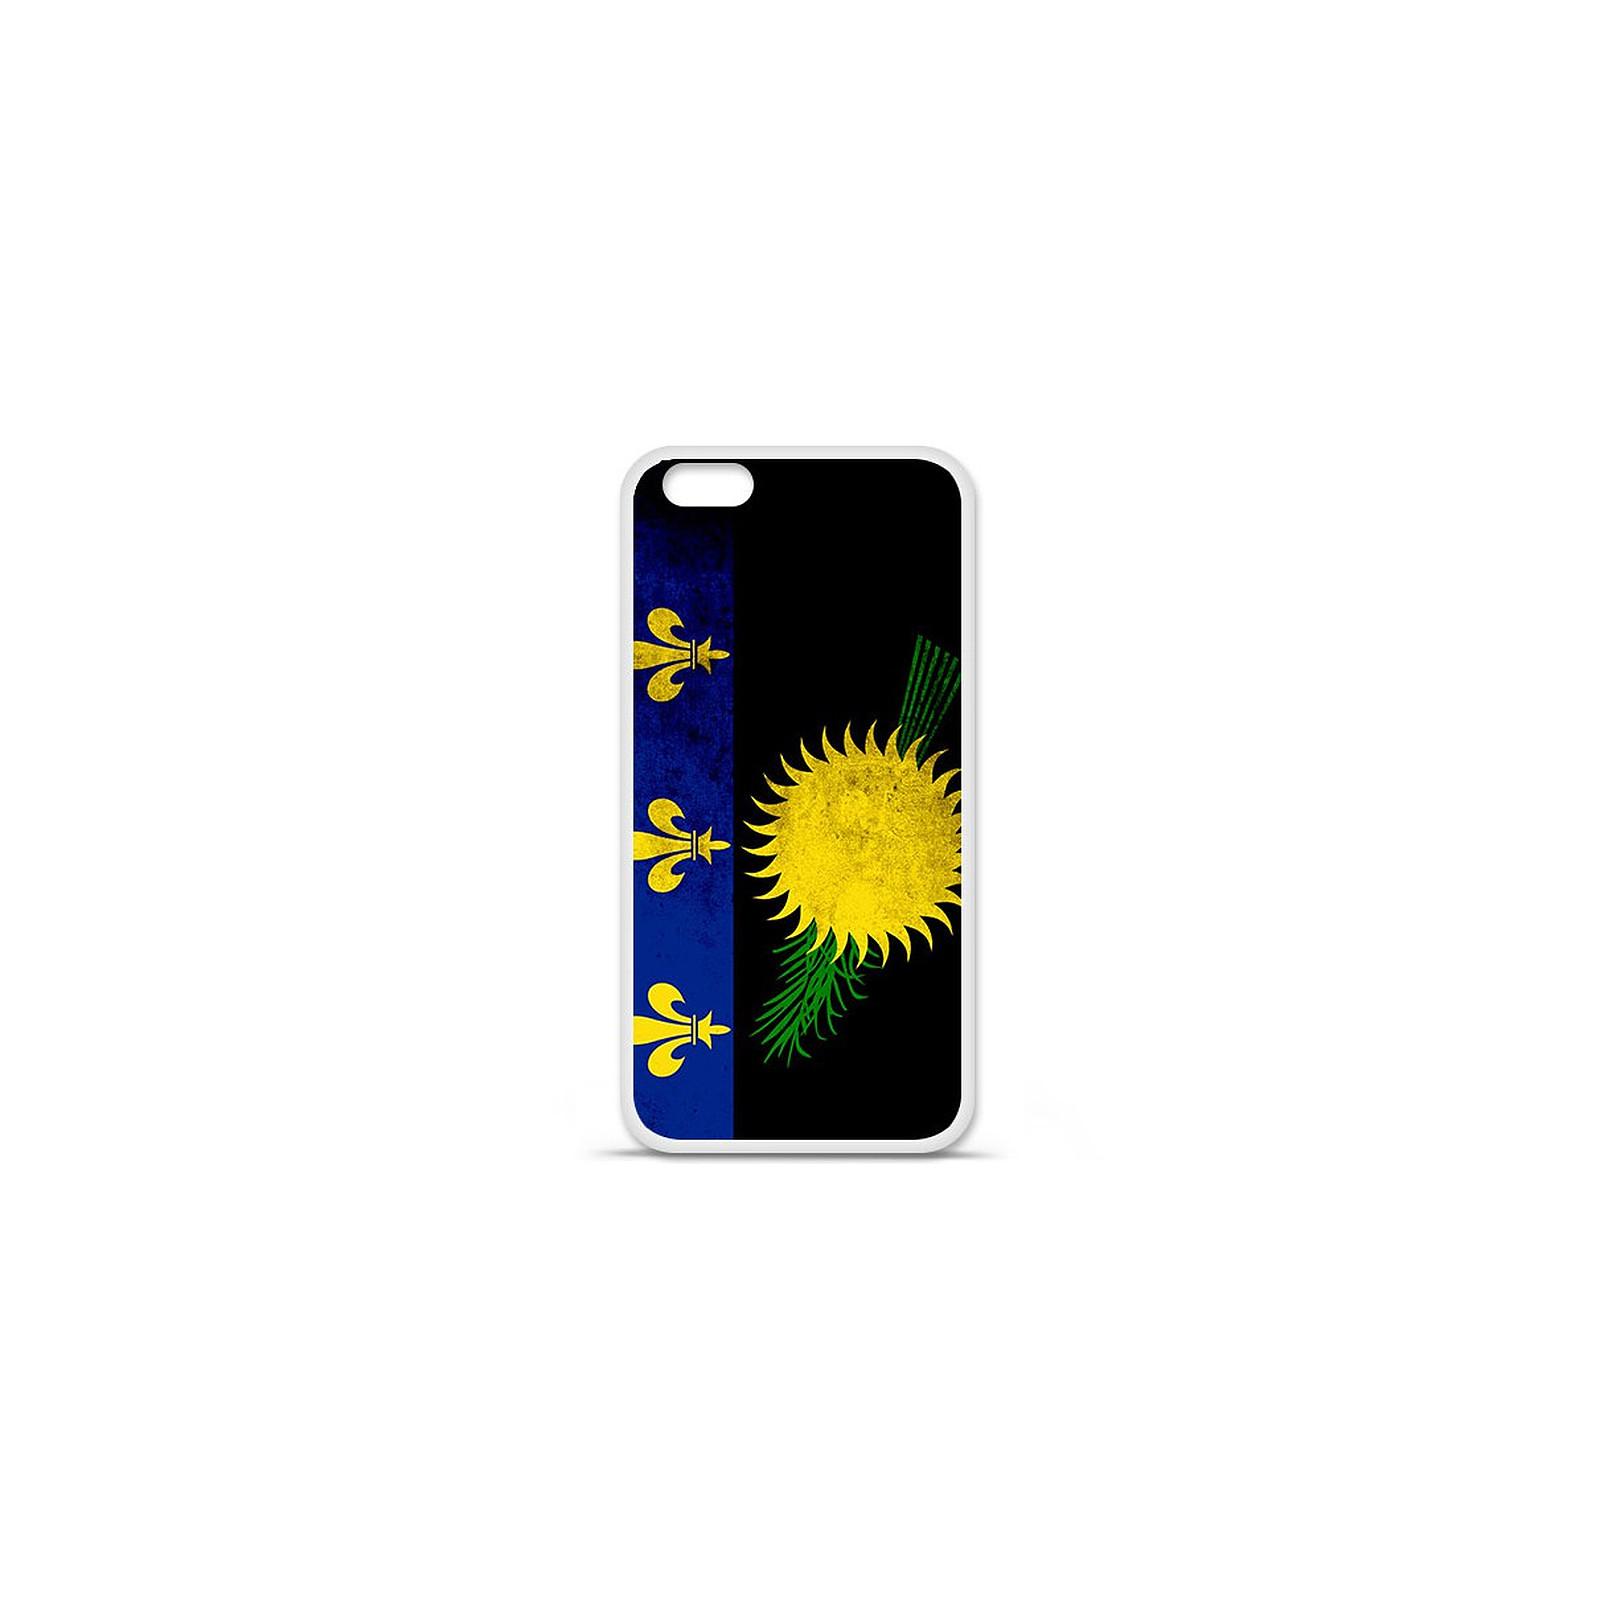 1001 Coques Coque silicone gel Apple IPhone 7 Plus motif Drapeau Guadeloupe